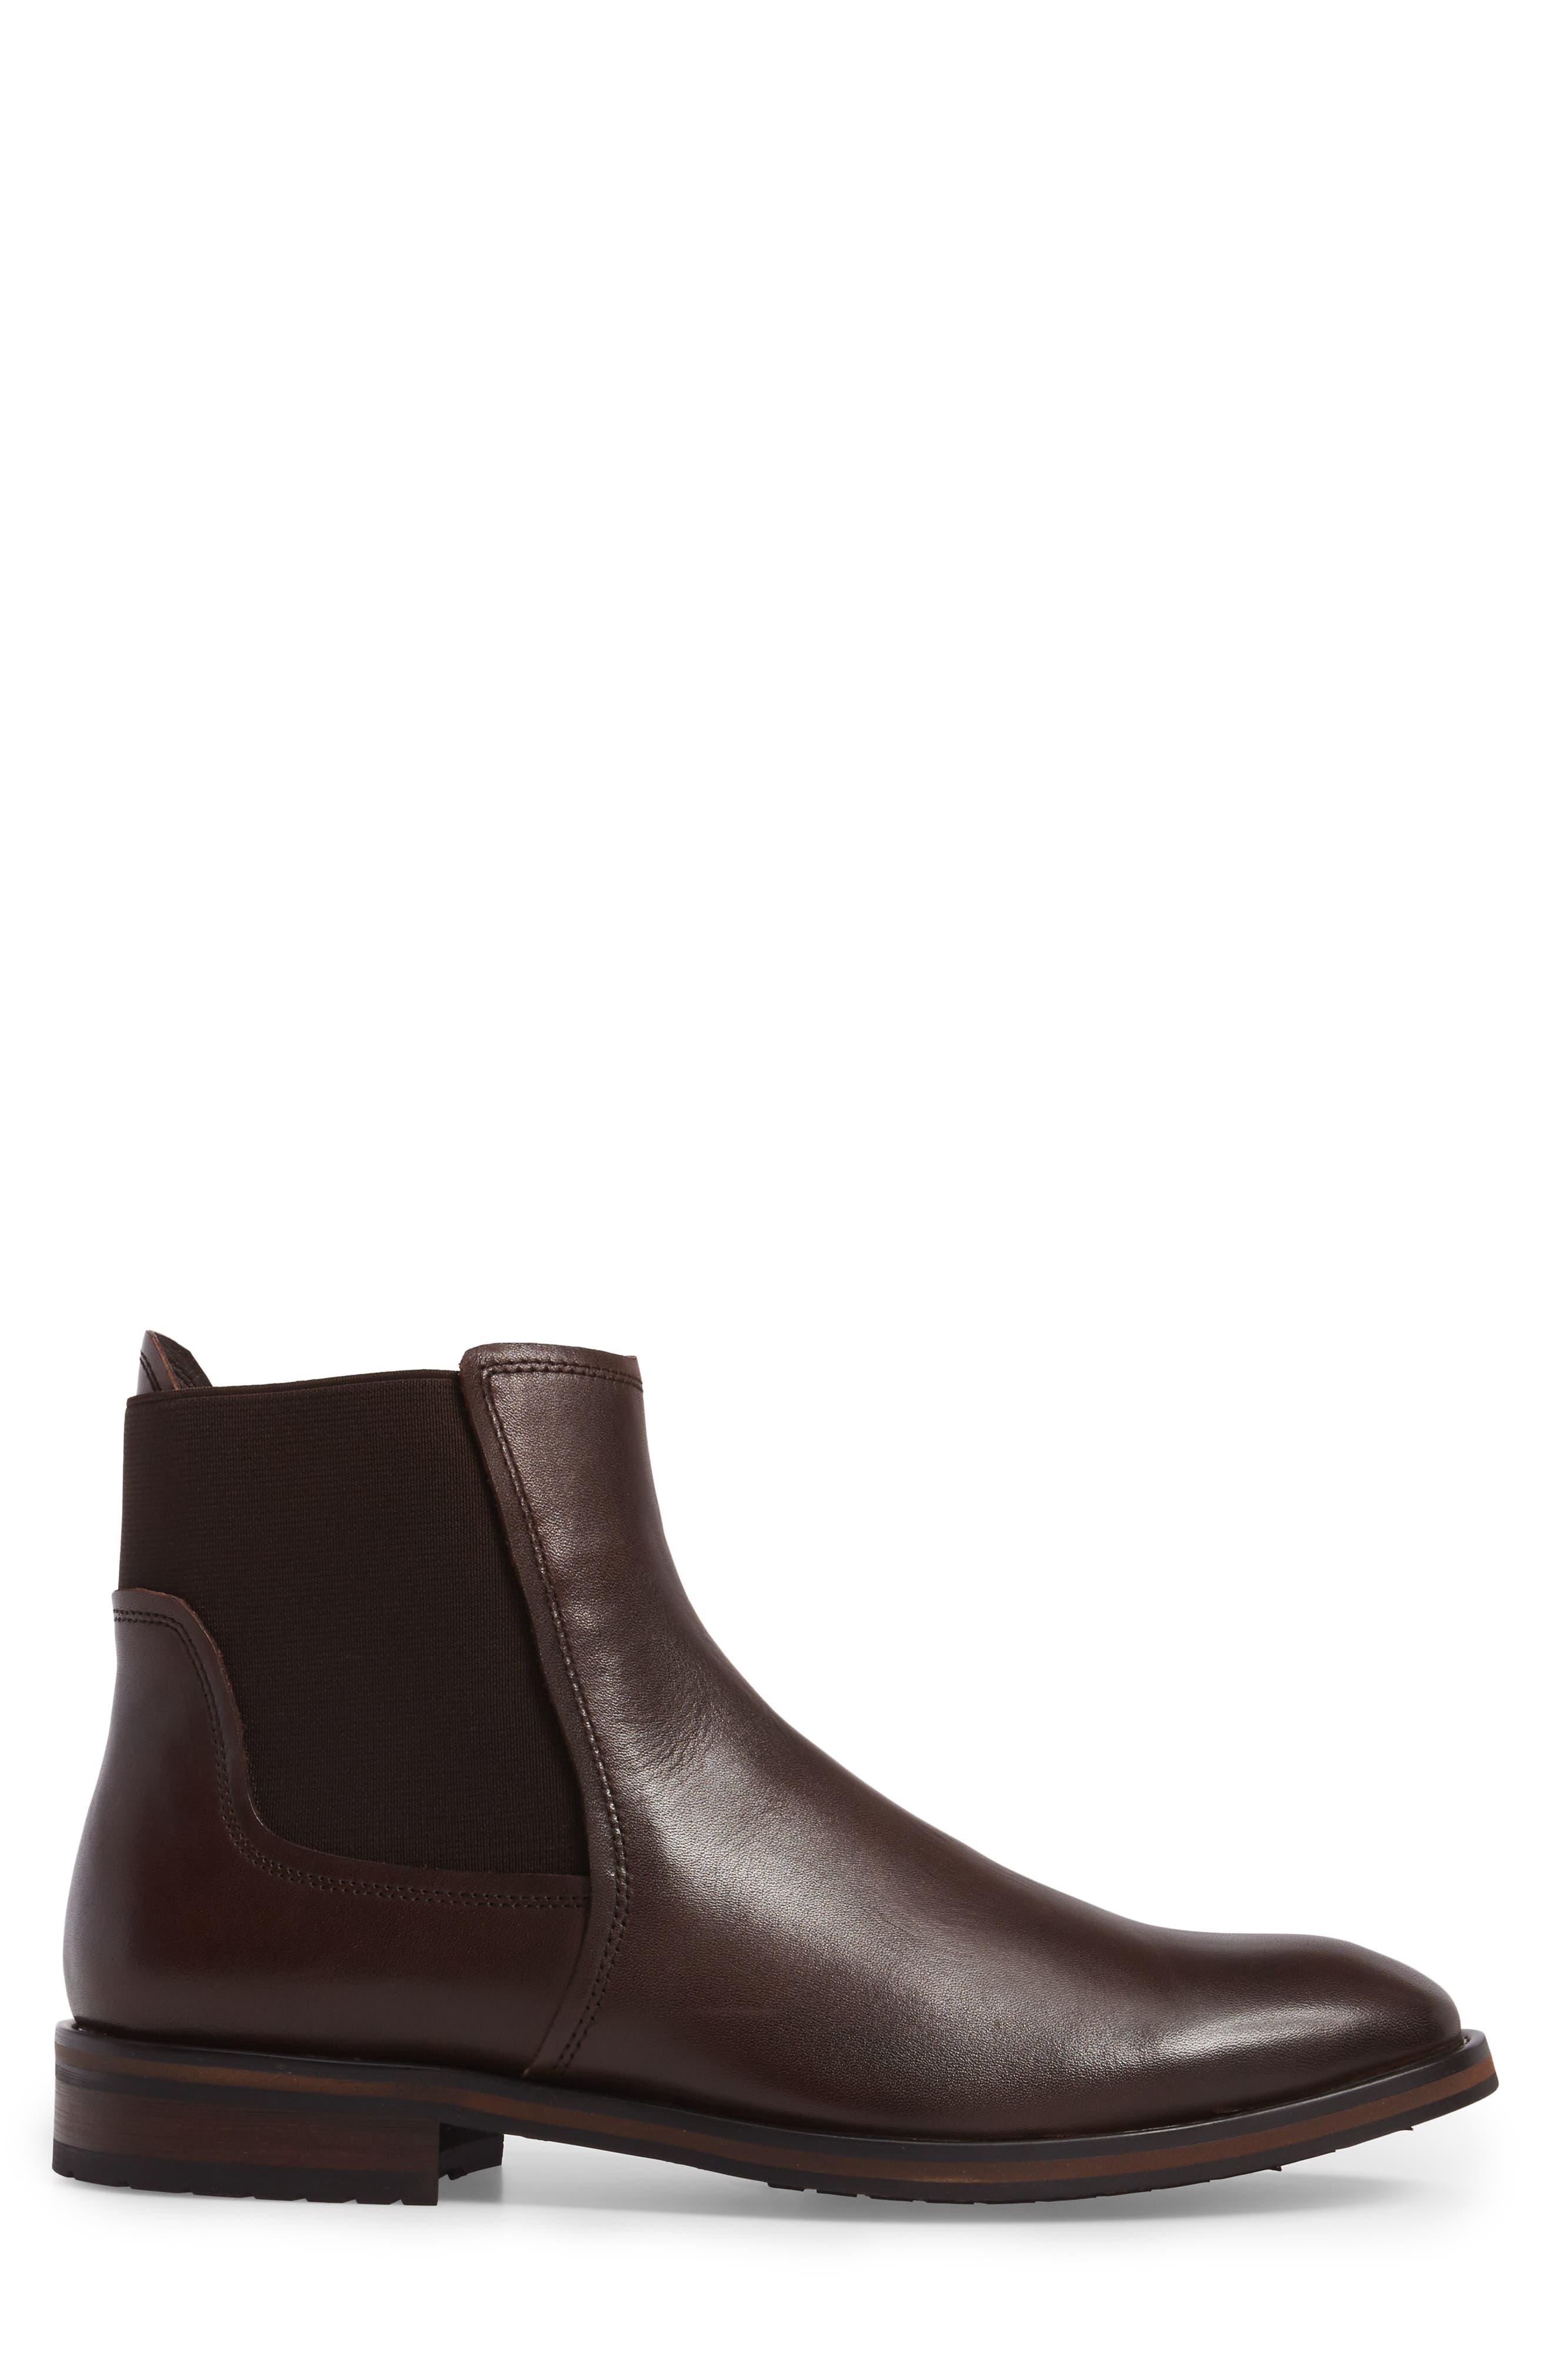 Alternate Image 3  - English Laundry Belmont Chelsea Boot (Men)